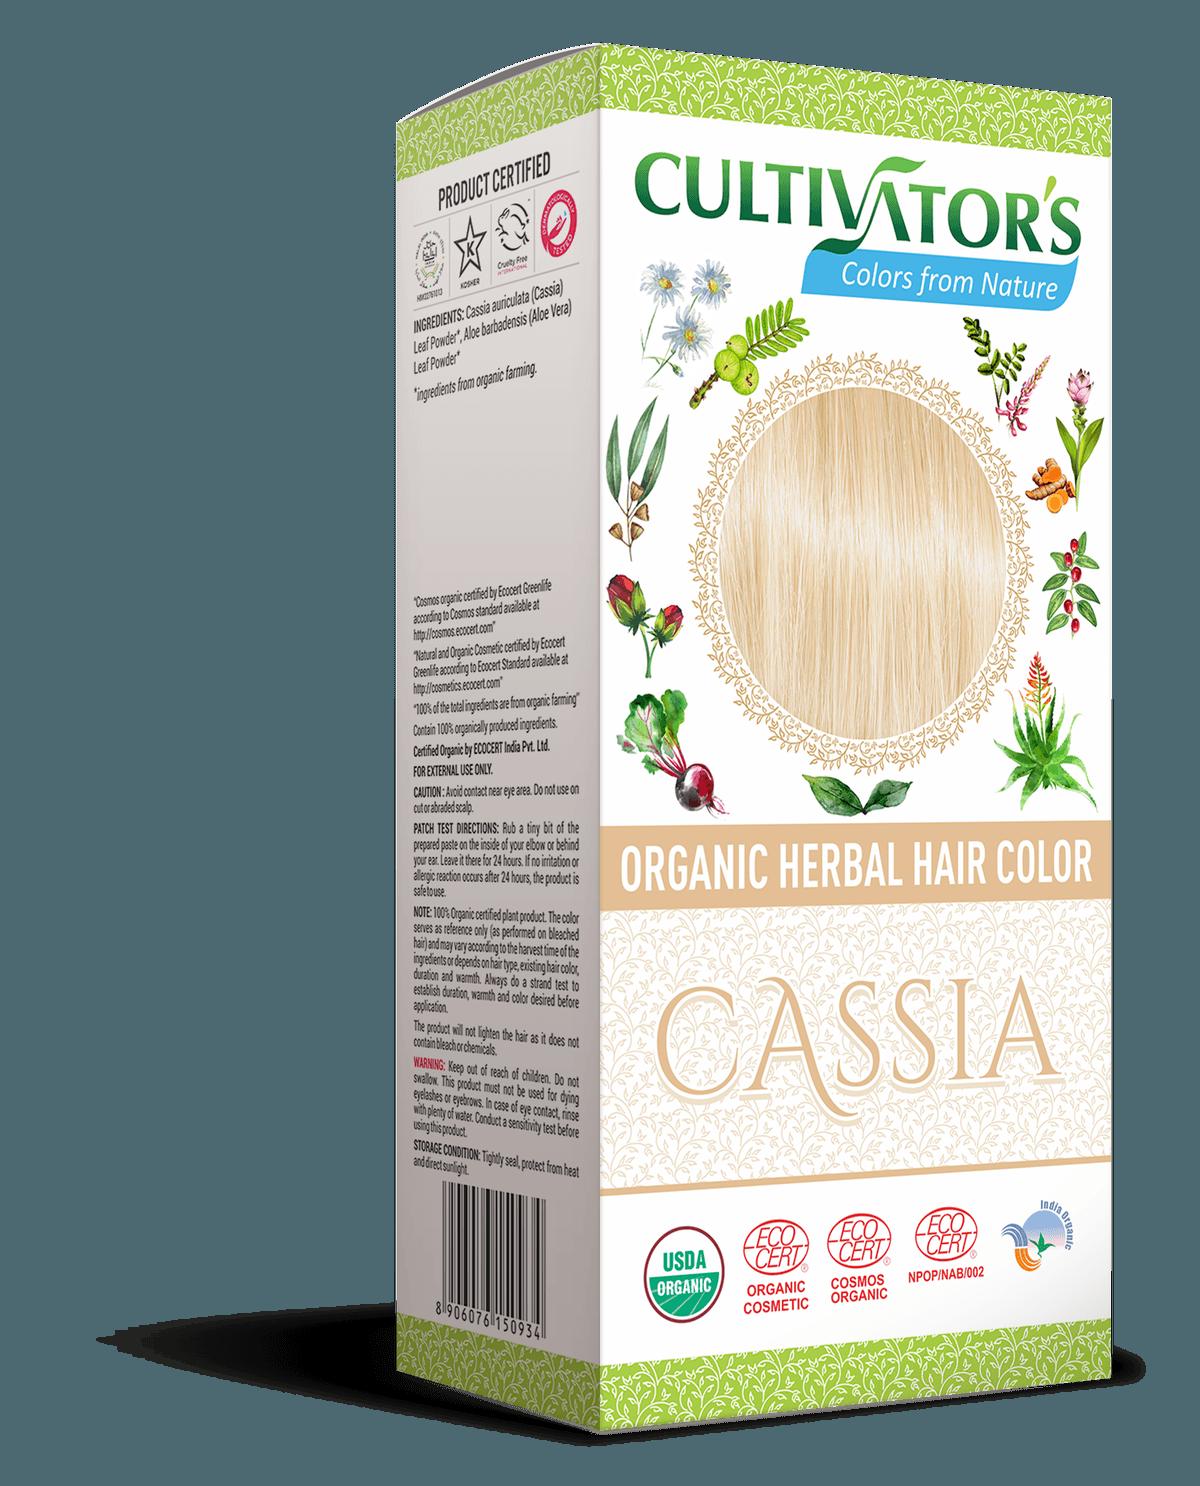 Cultivator s Luomusertifioitu Kasviväri  cbbcc75cad